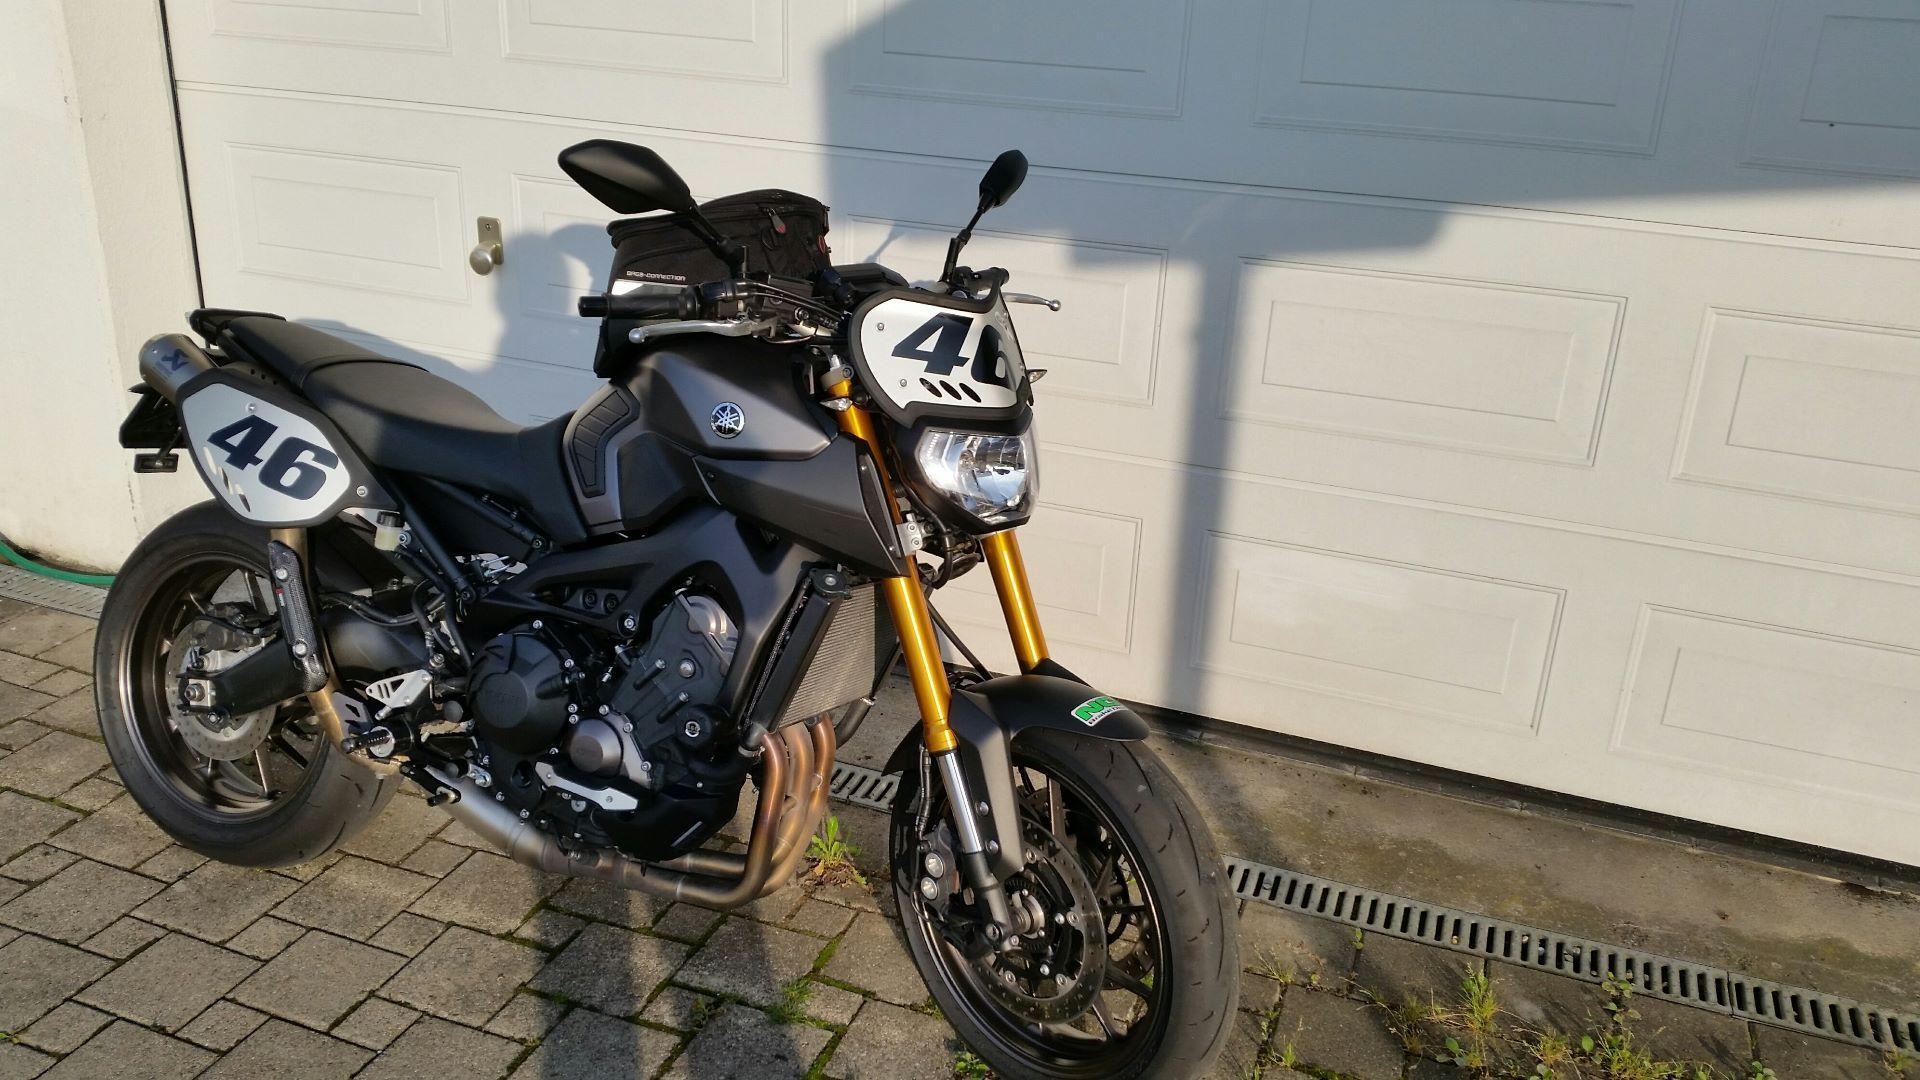 motorrad occasion kaufen yamaha mt 09 abs moto burch k giswil. Black Bedroom Furniture Sets. Home Design Ideas